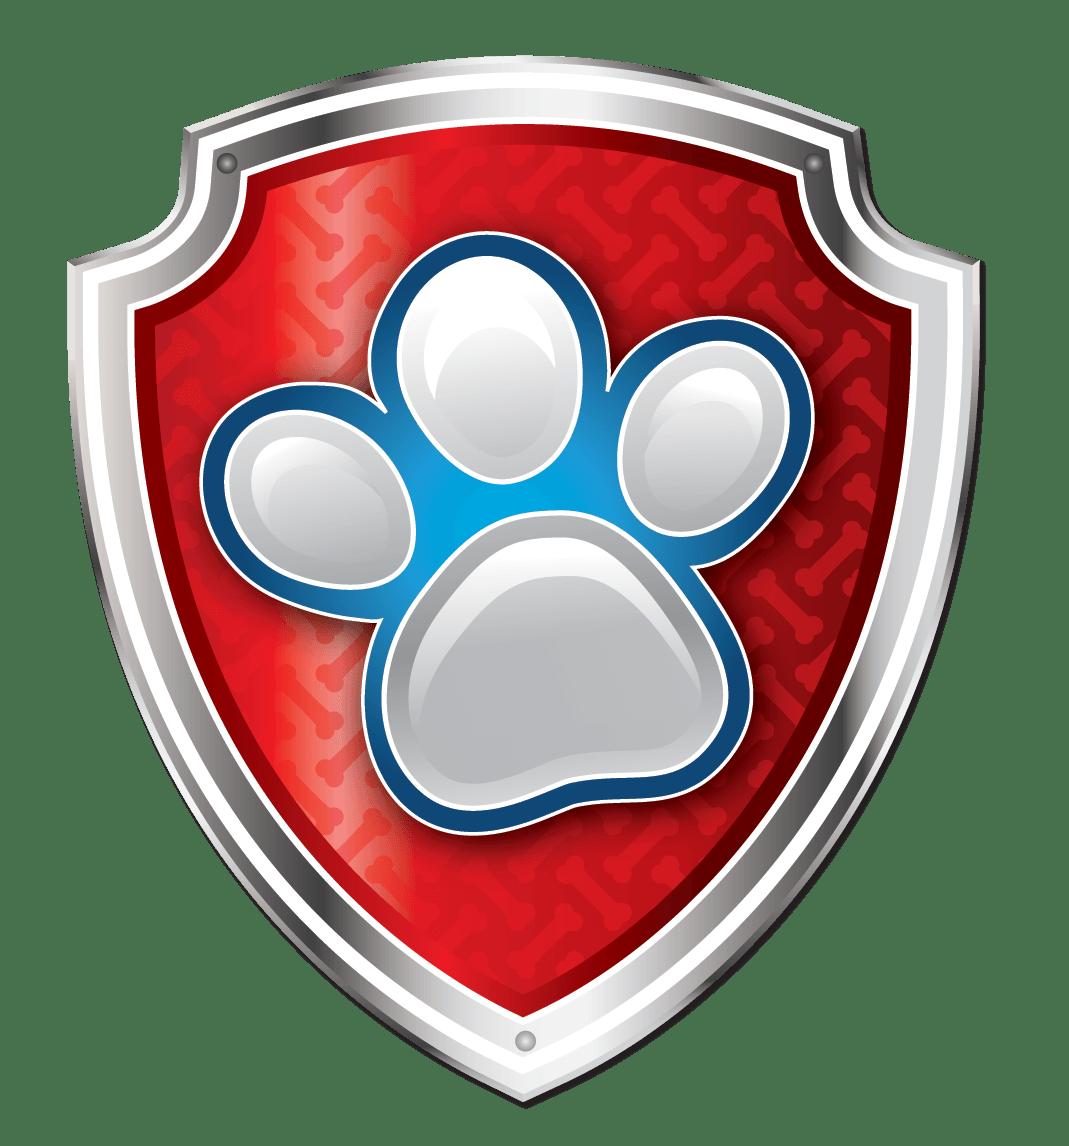 PAW Patrol | Heroes Wiki | Fandom